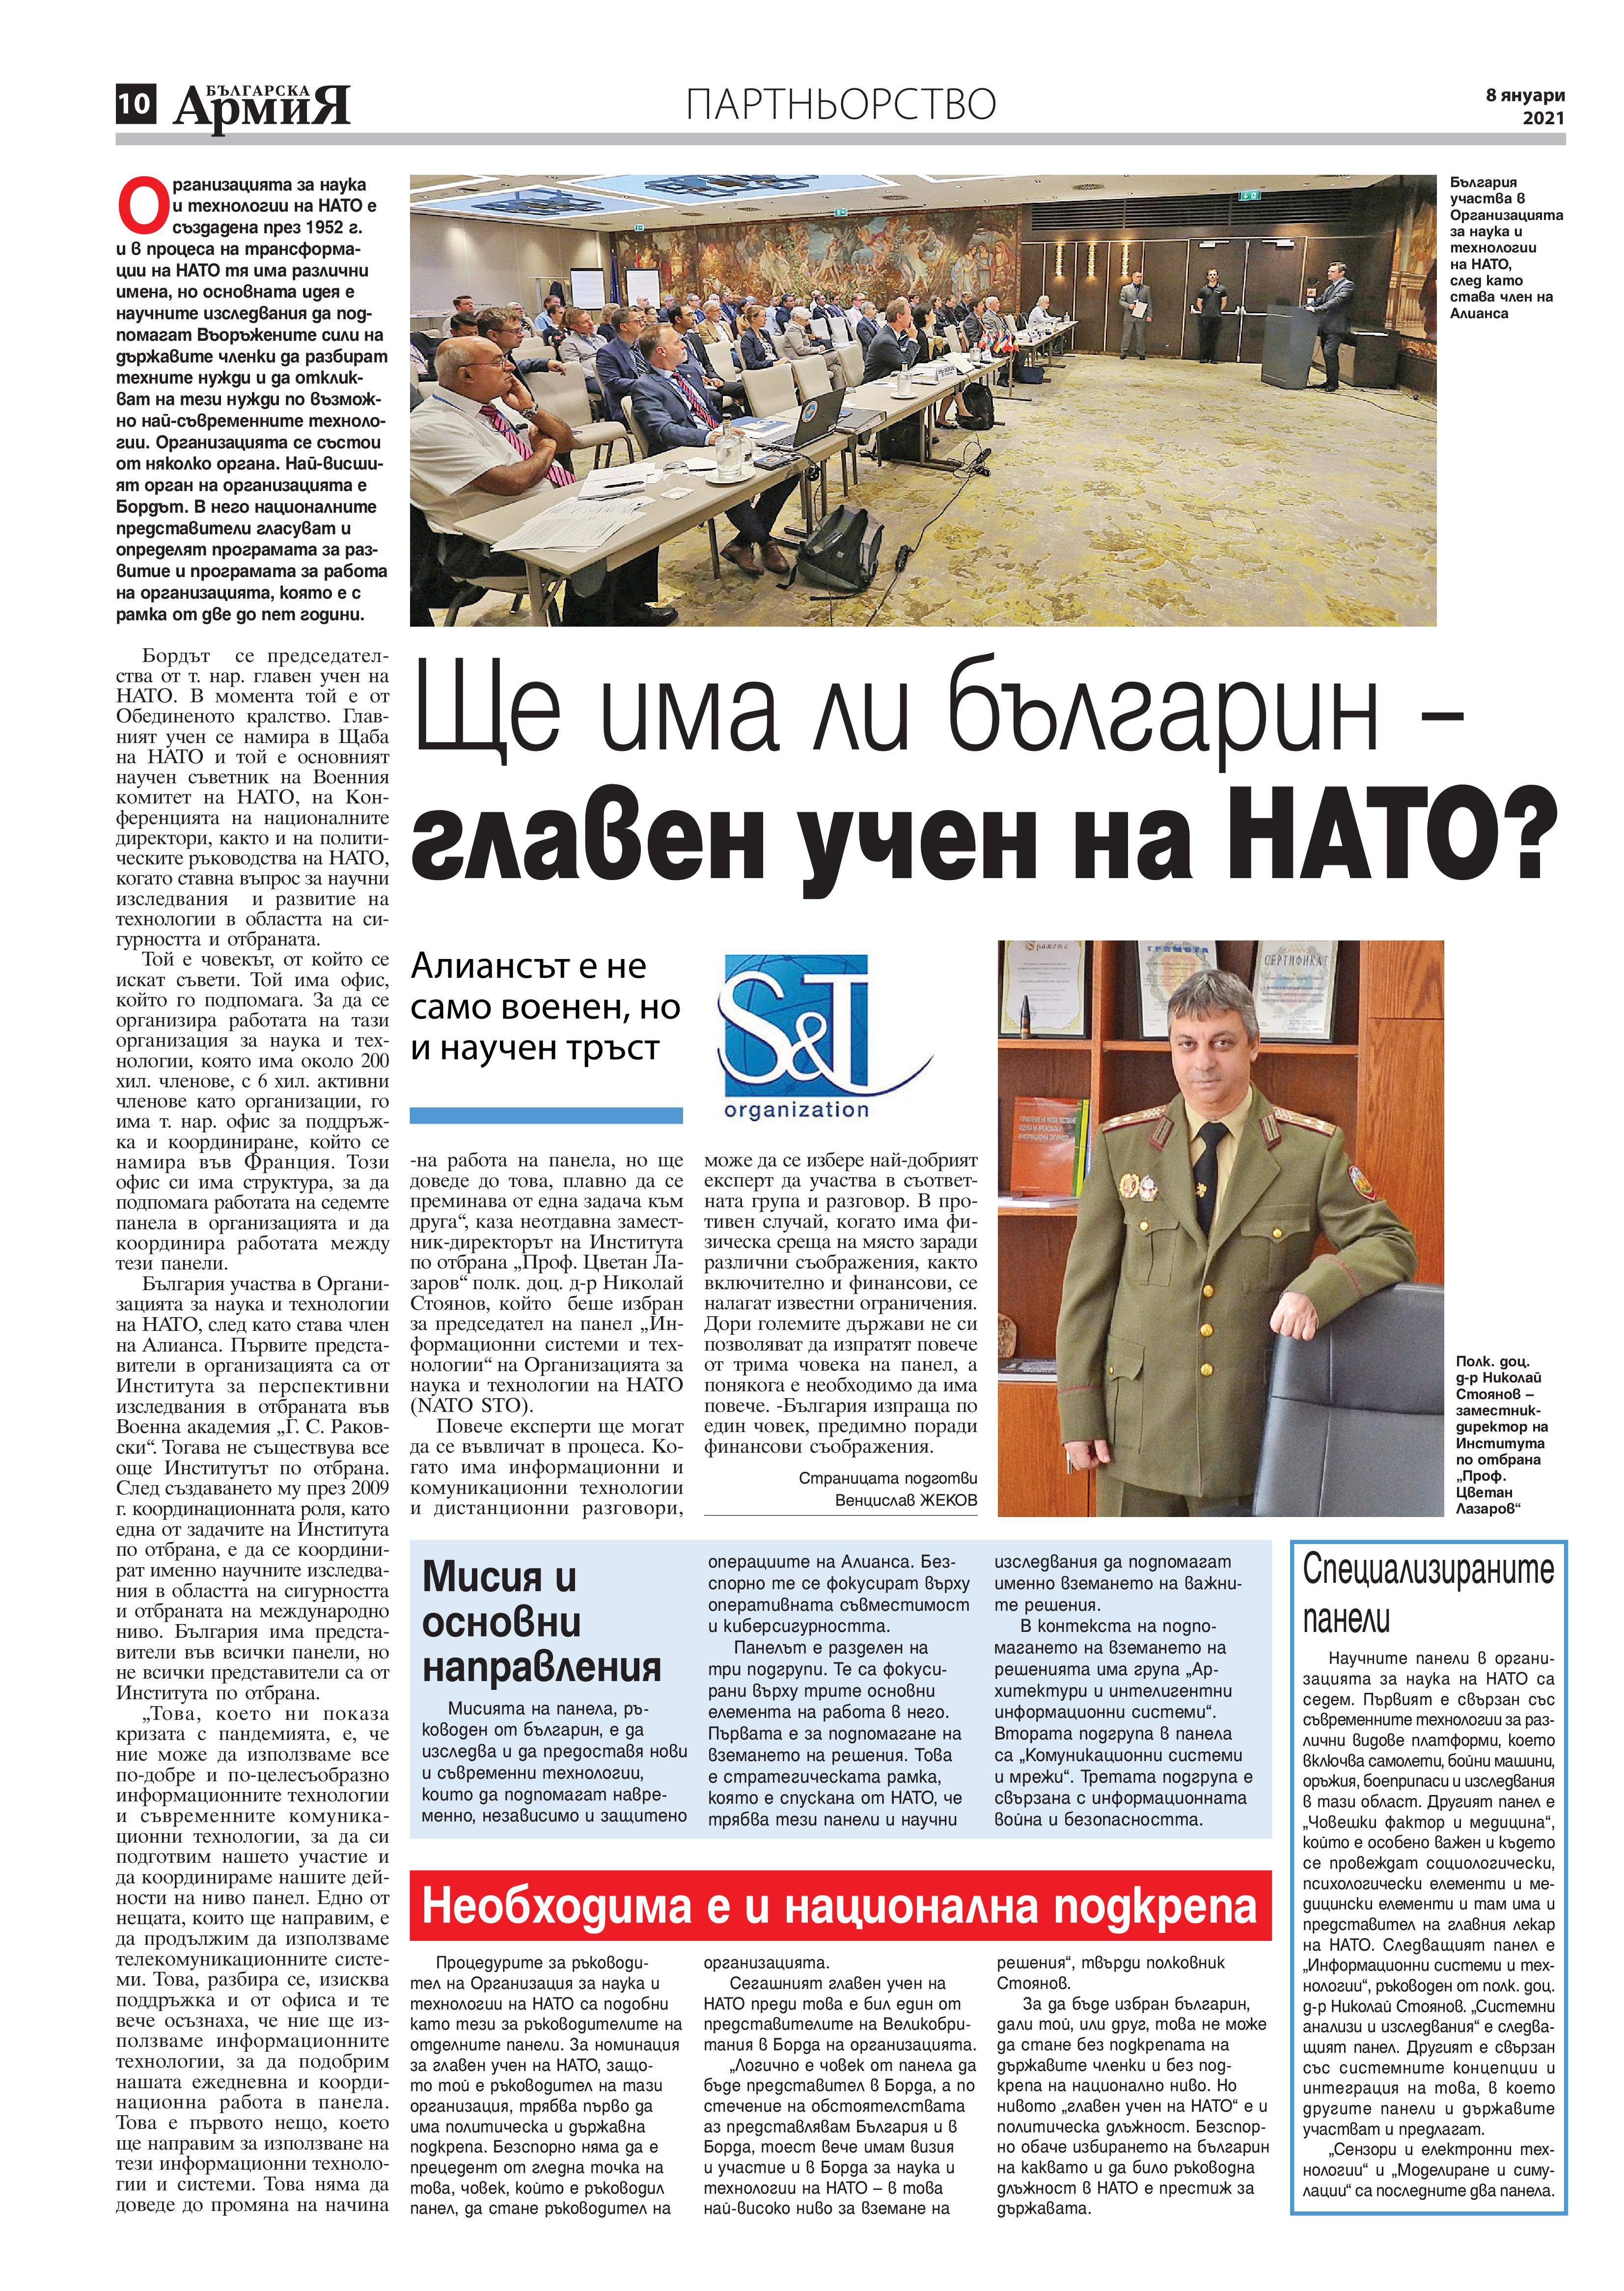 https://armymedia.bg/wp-content/uploads/2015/06/10-55.jpg